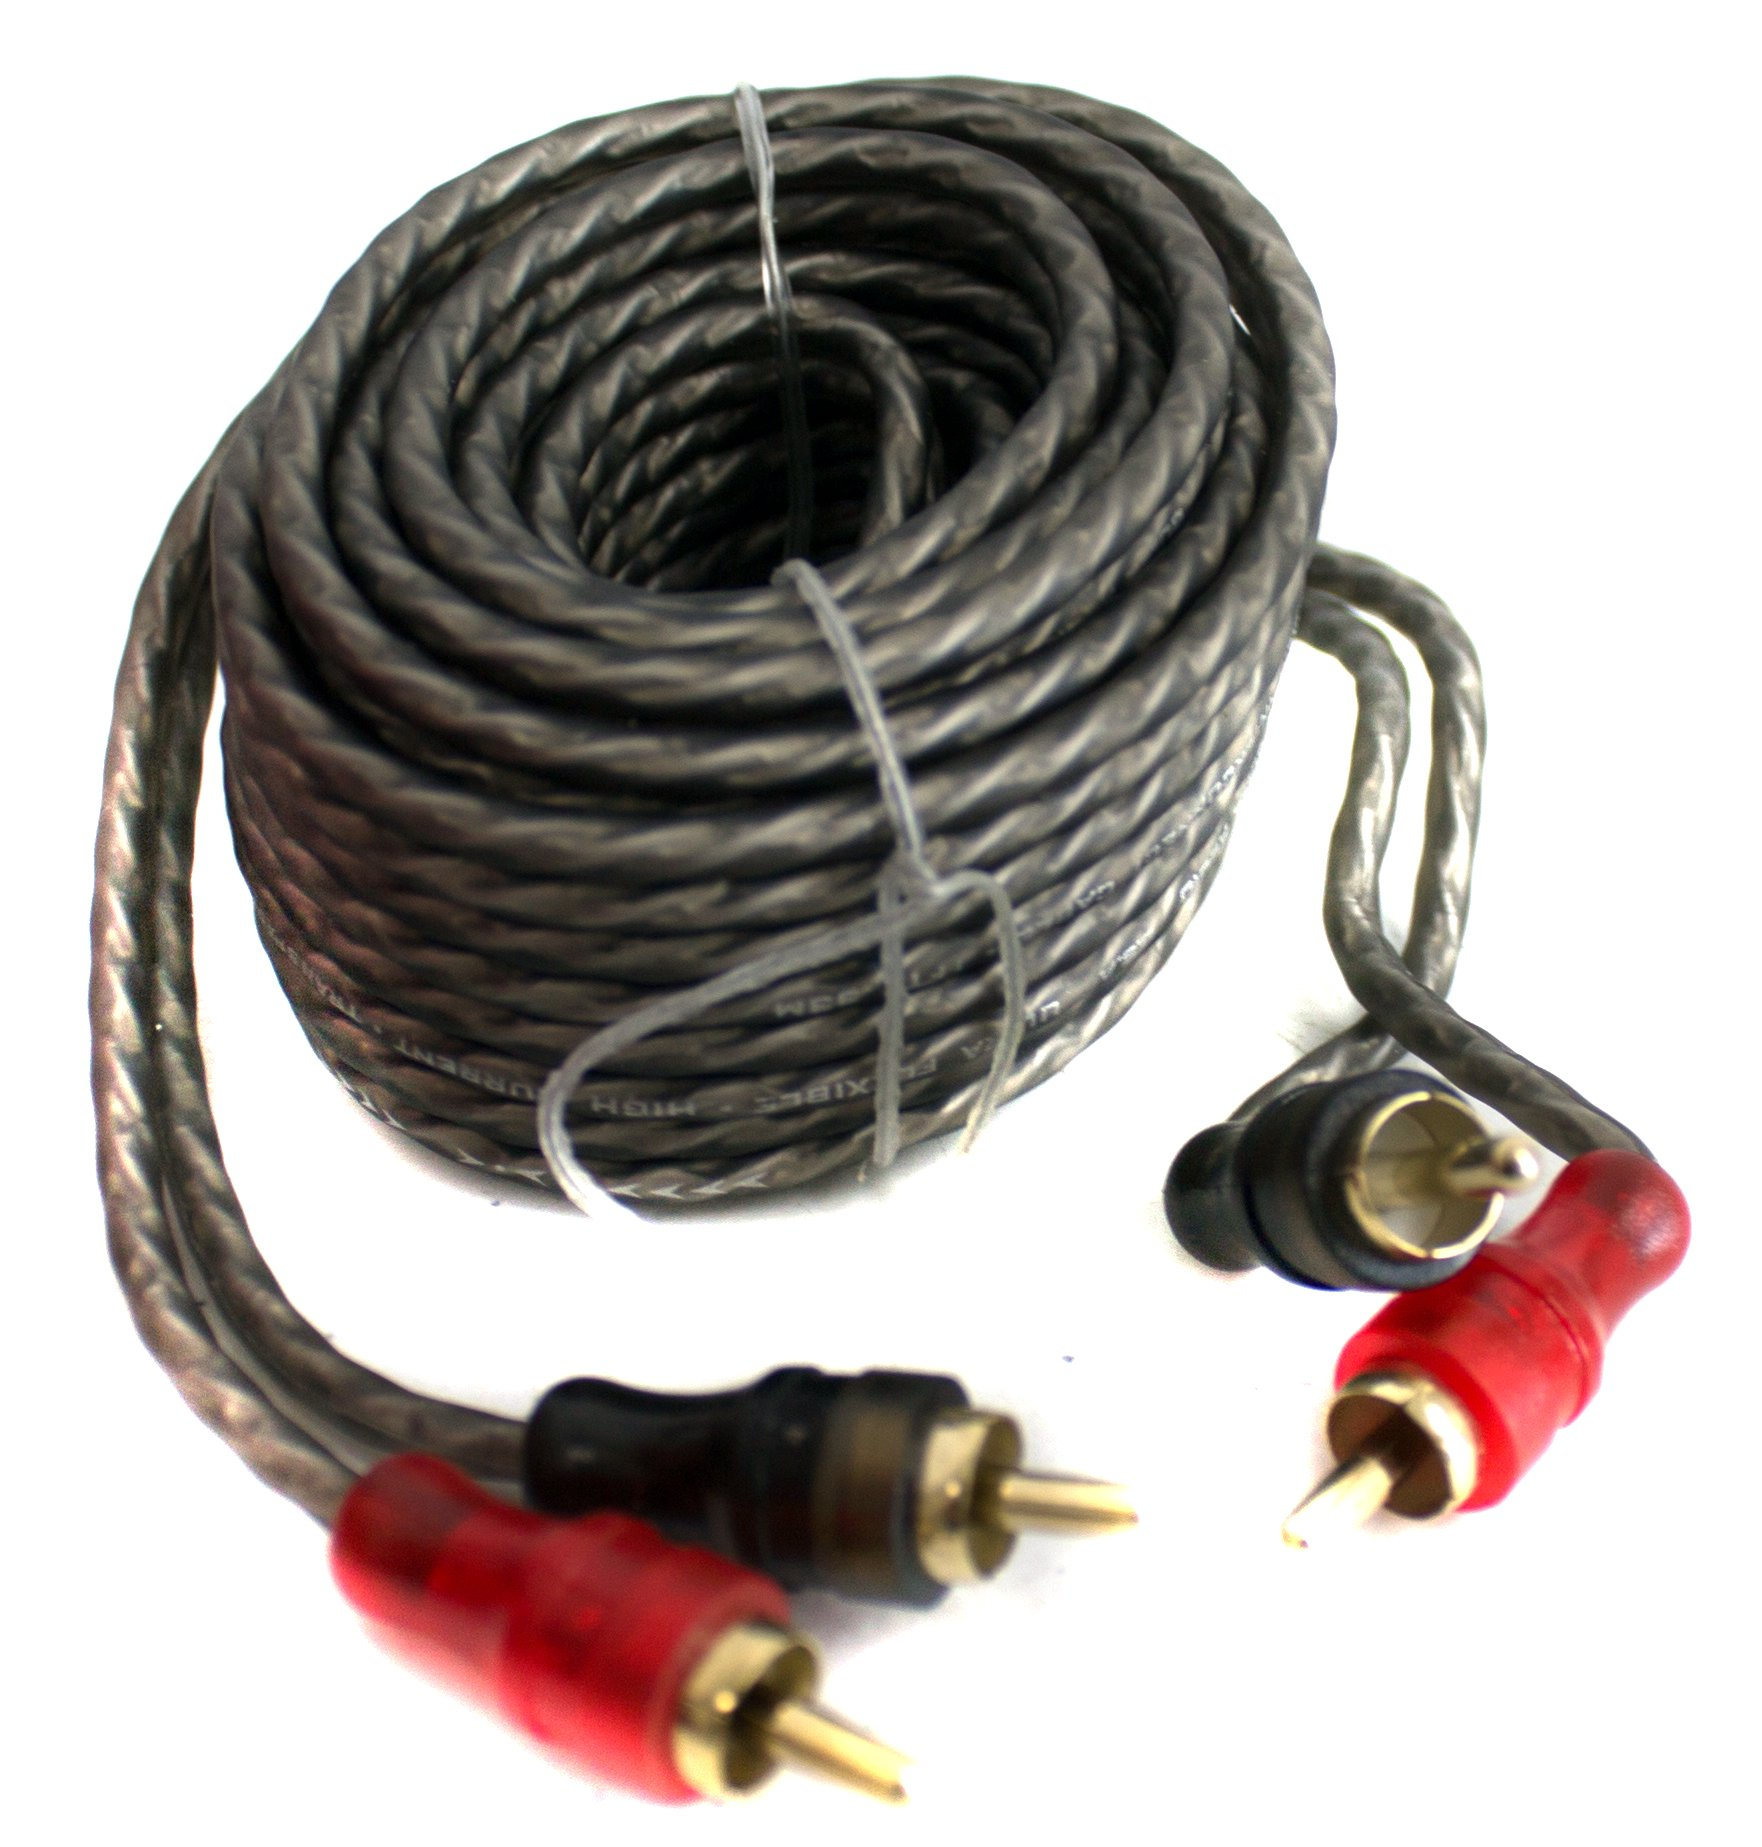 bullz audio 4 gauge 3000w professional car amplifier wiring amp kit red bpe4r walmart canada [ 2000 x 2000 Pixel ]